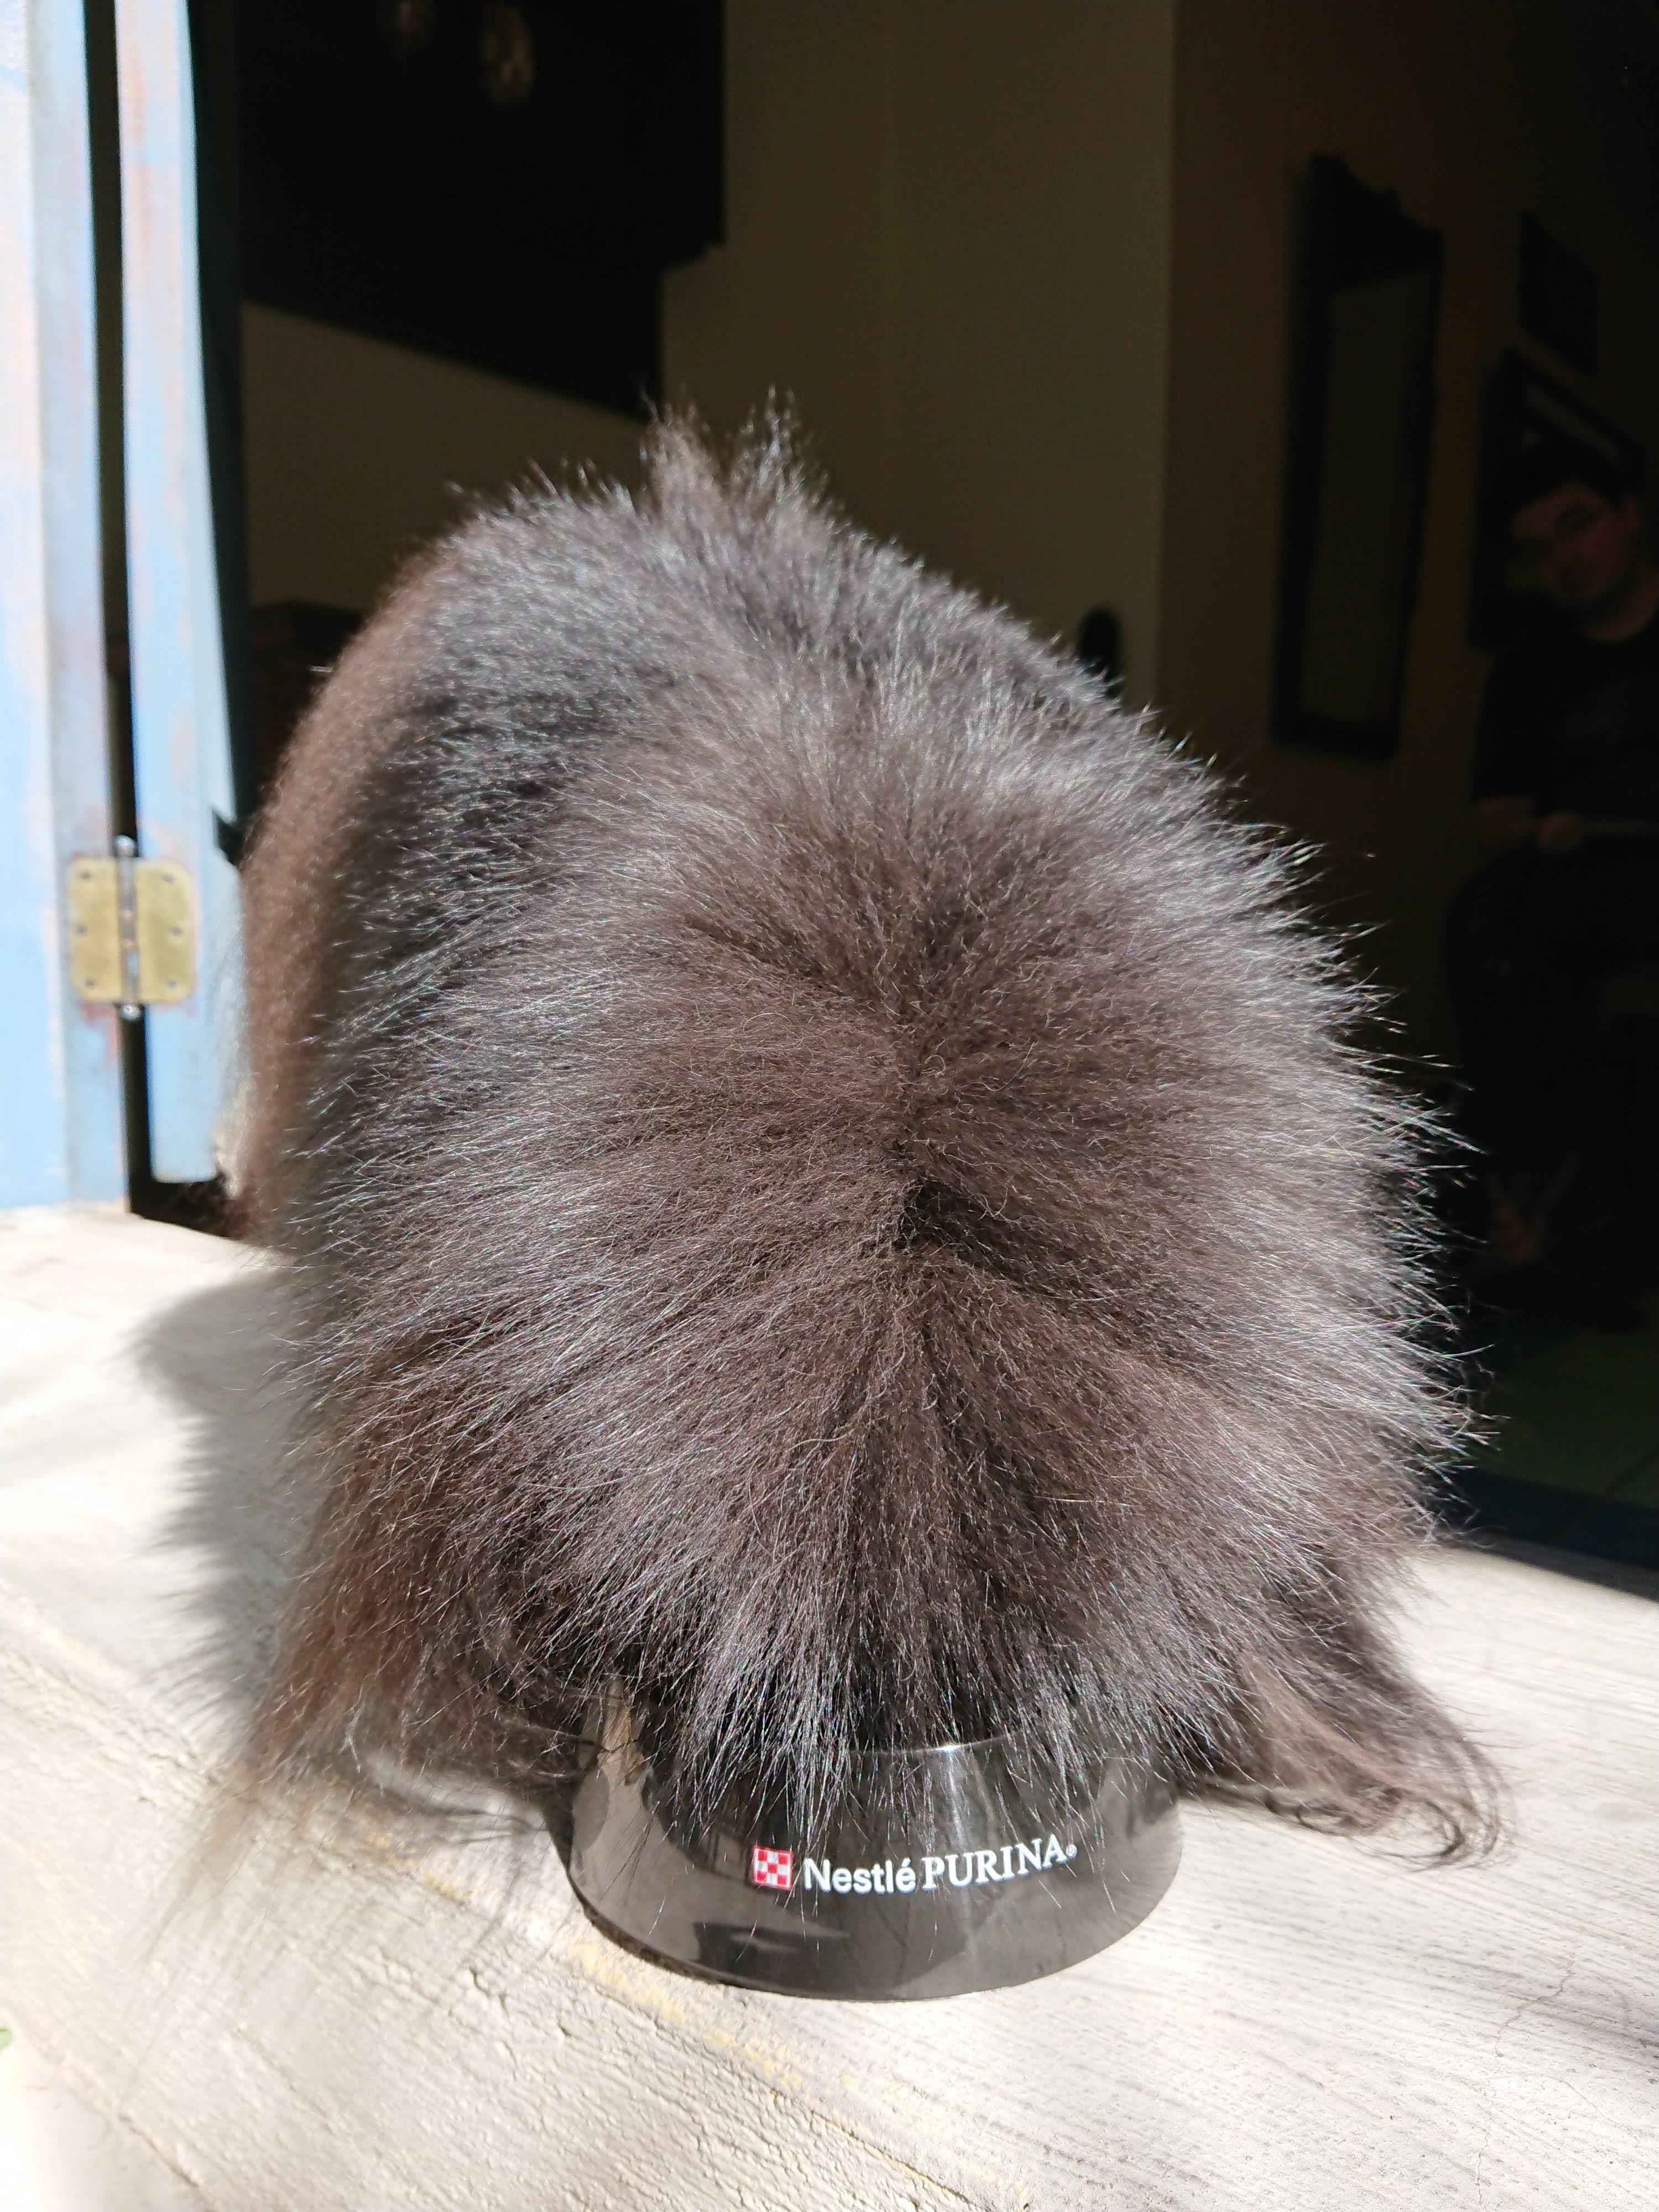 cachorro peludo no comedouro